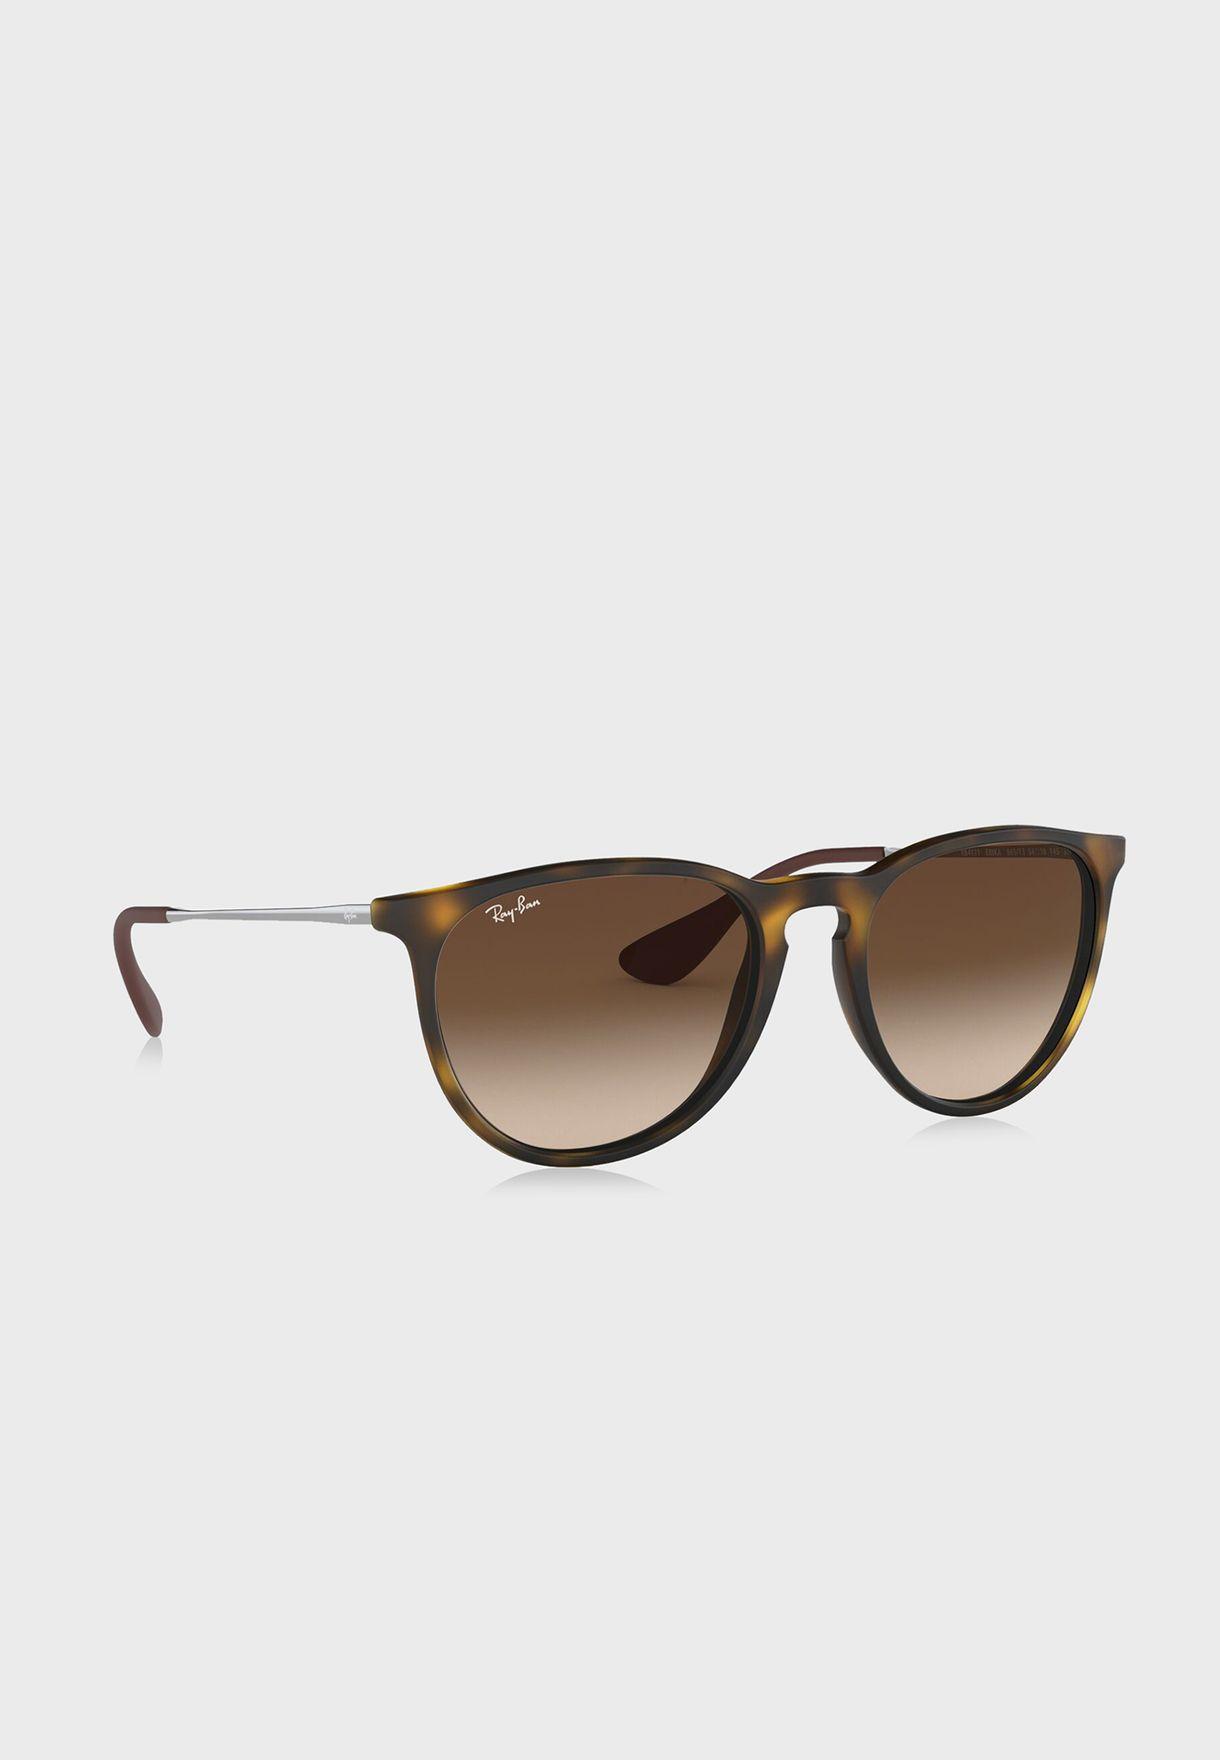 0RB4171 Erika Cateye Sunglasses